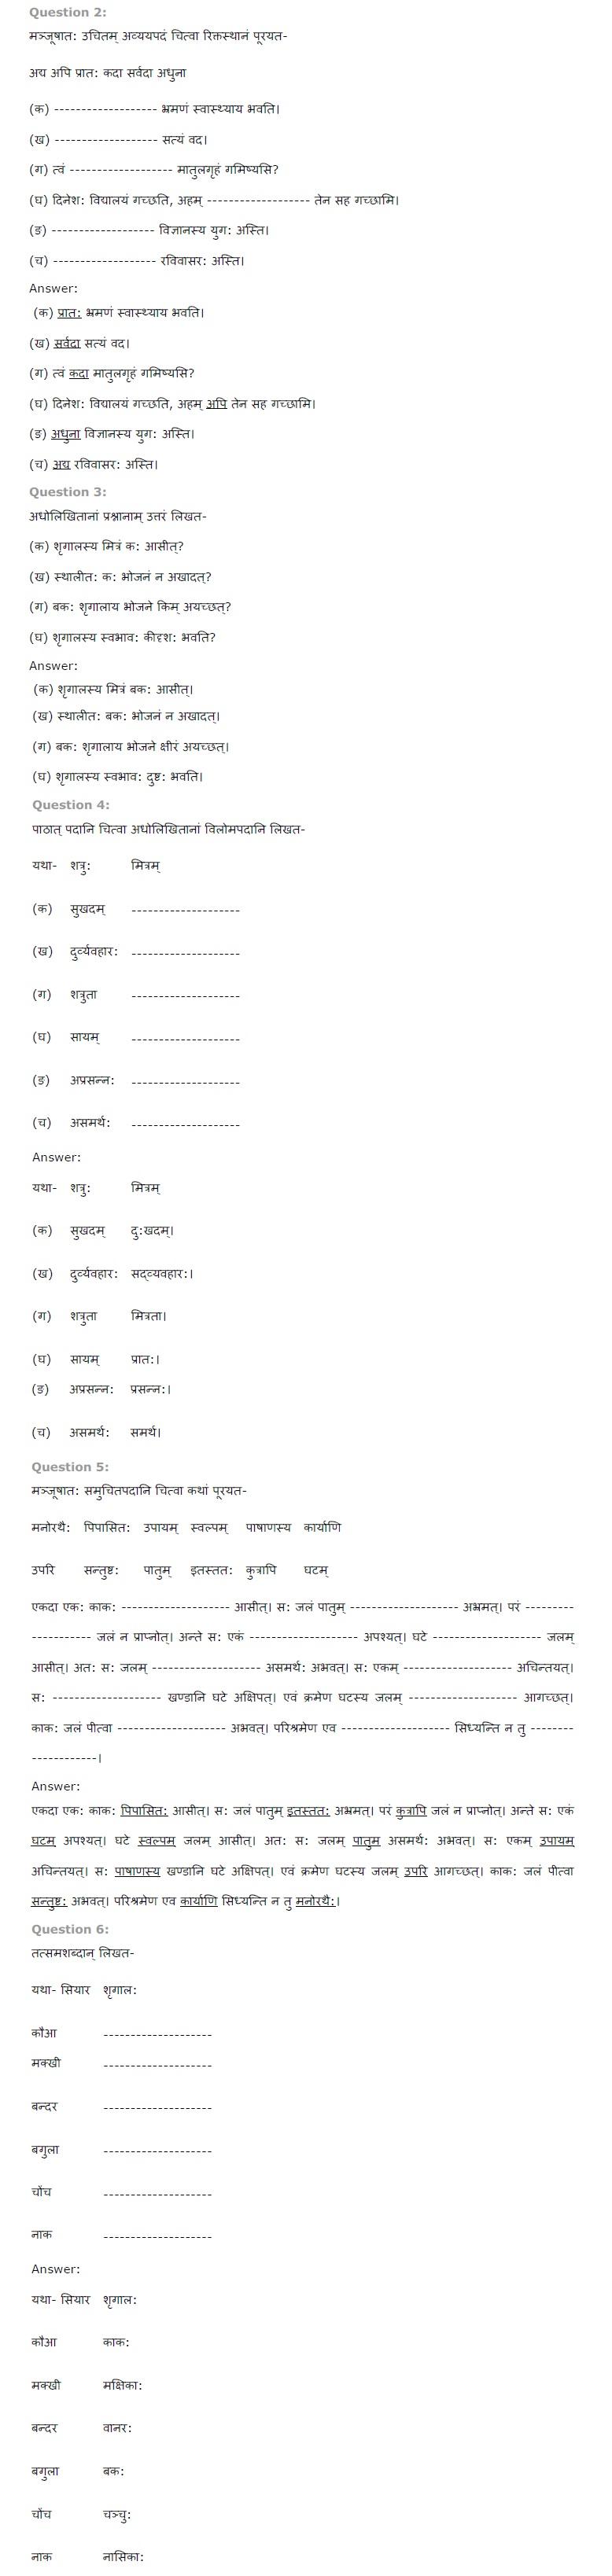 NCERT Solutions Class 6 Sanskrit Chapter 11 बकस्य प्रतीकार अव्ययप्रयोग